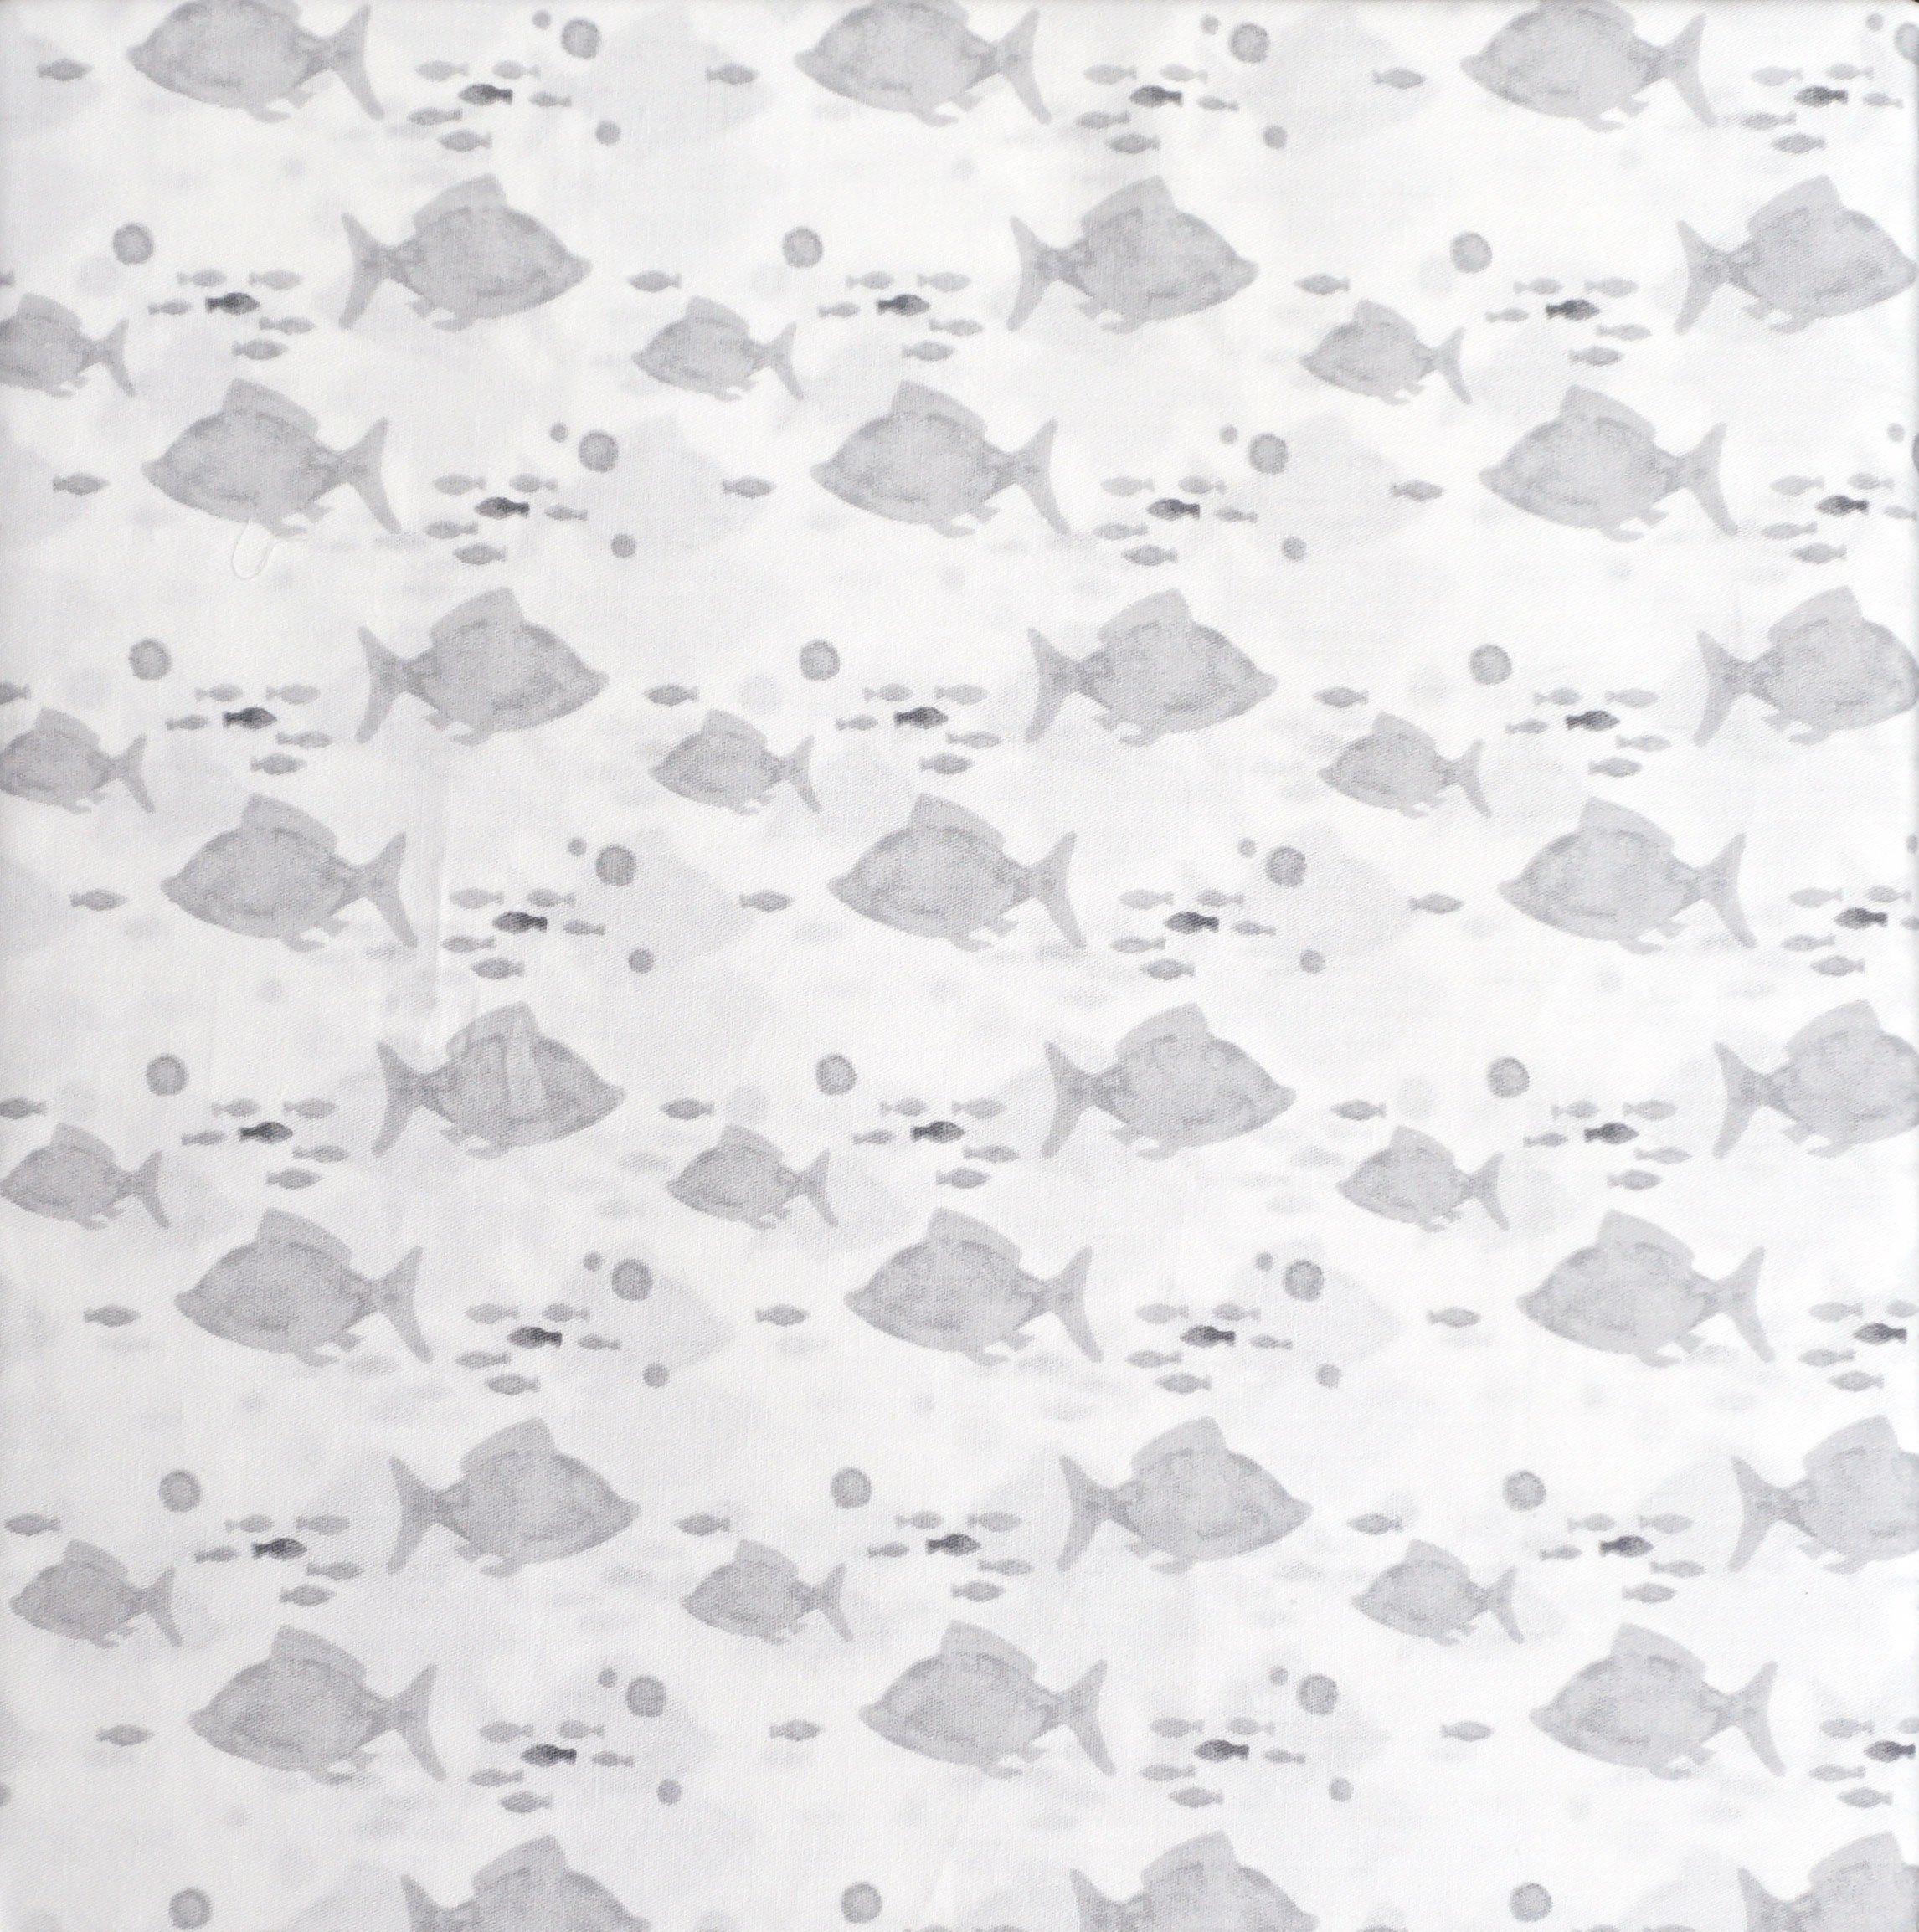 Sea Ocean Fish Summer Coastal Collection Bedding Cotton Queen Sheet Set Light Gray on White Fish Schools Swimming